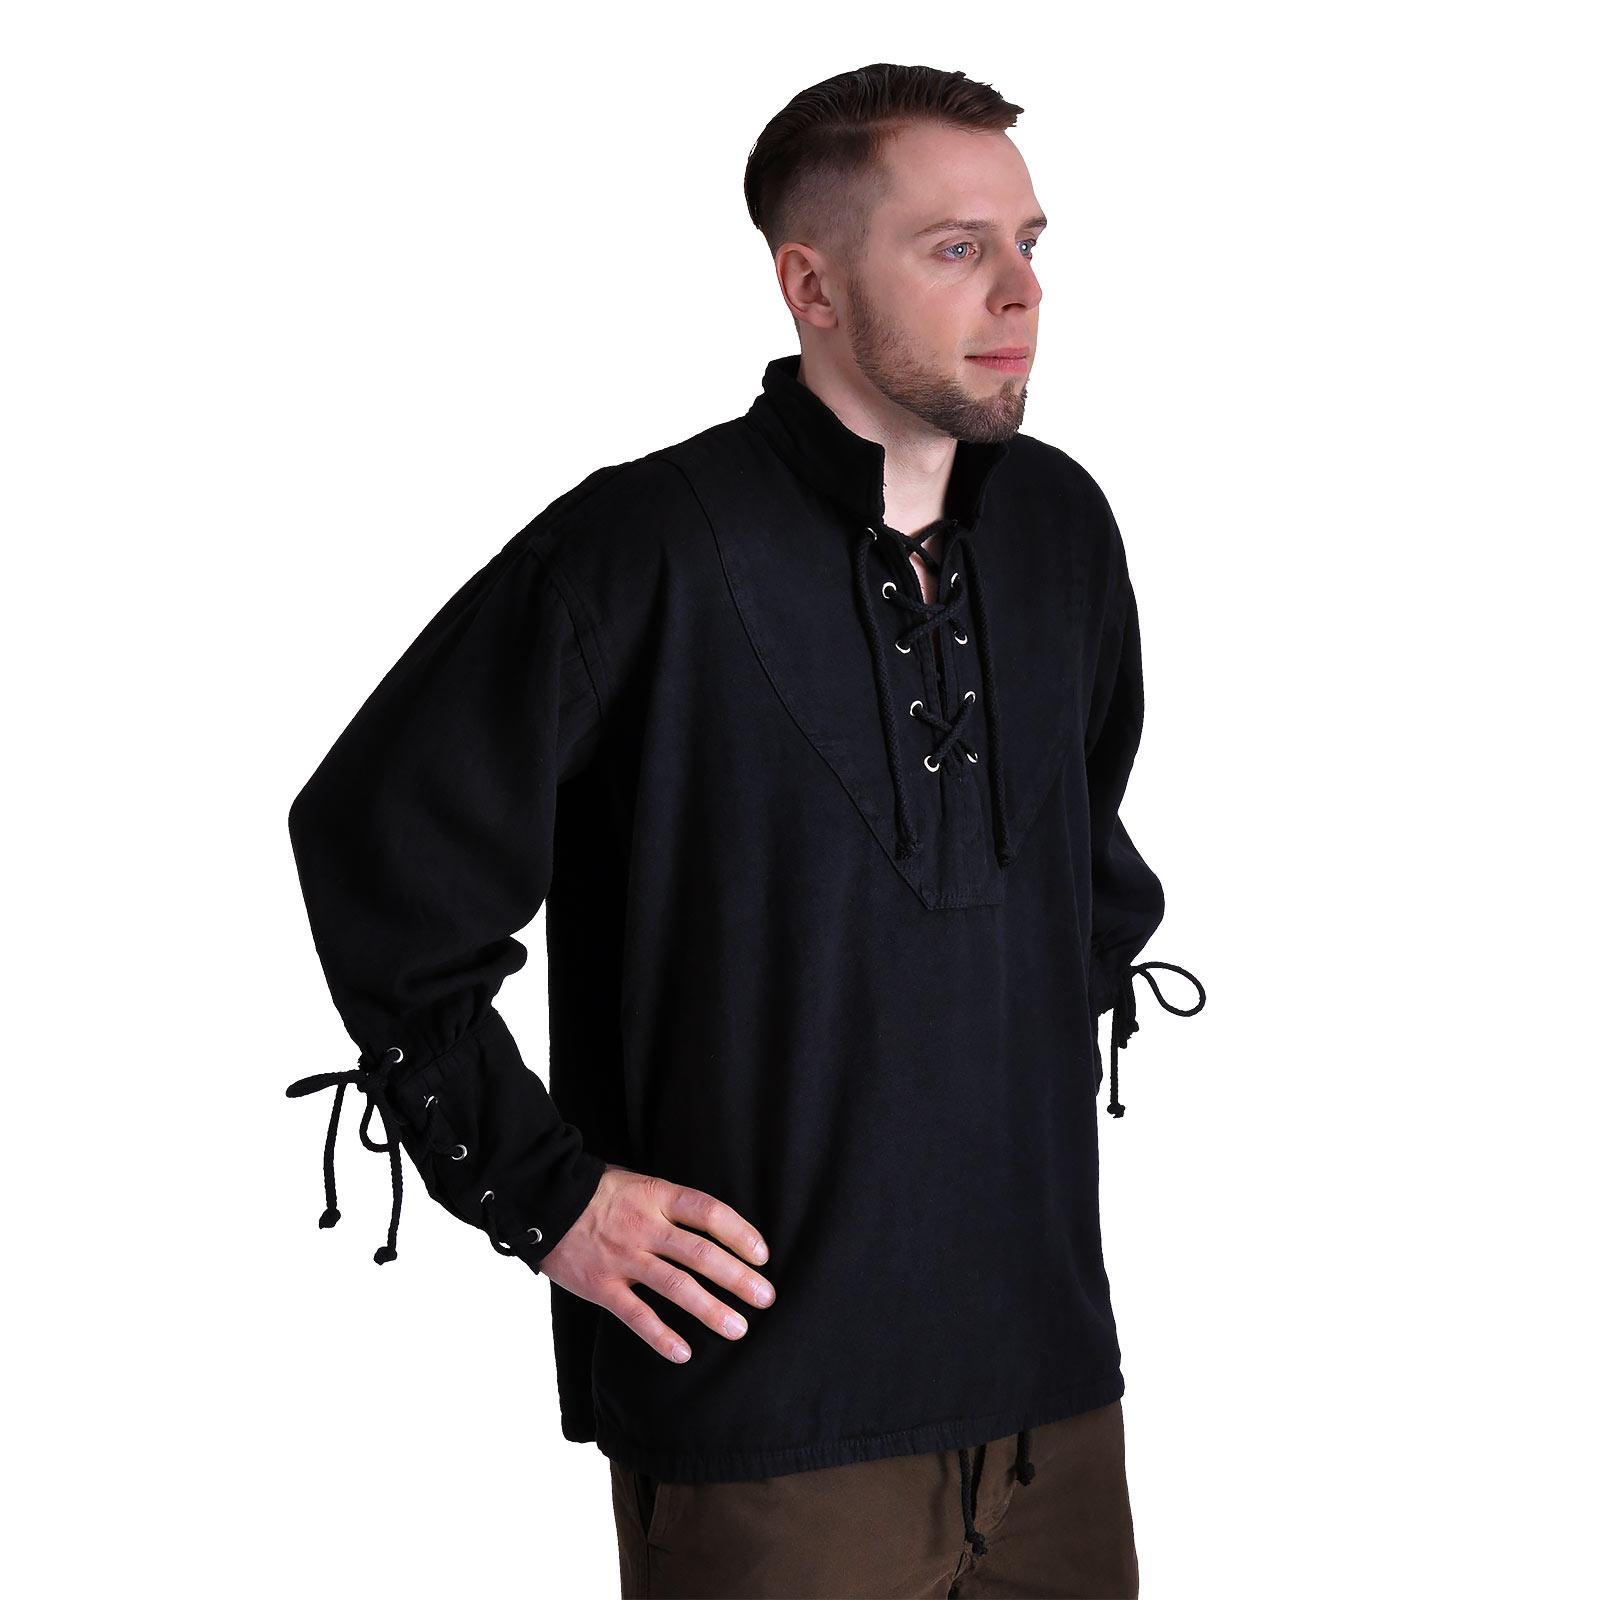 Mittelalter Hemd schwarz